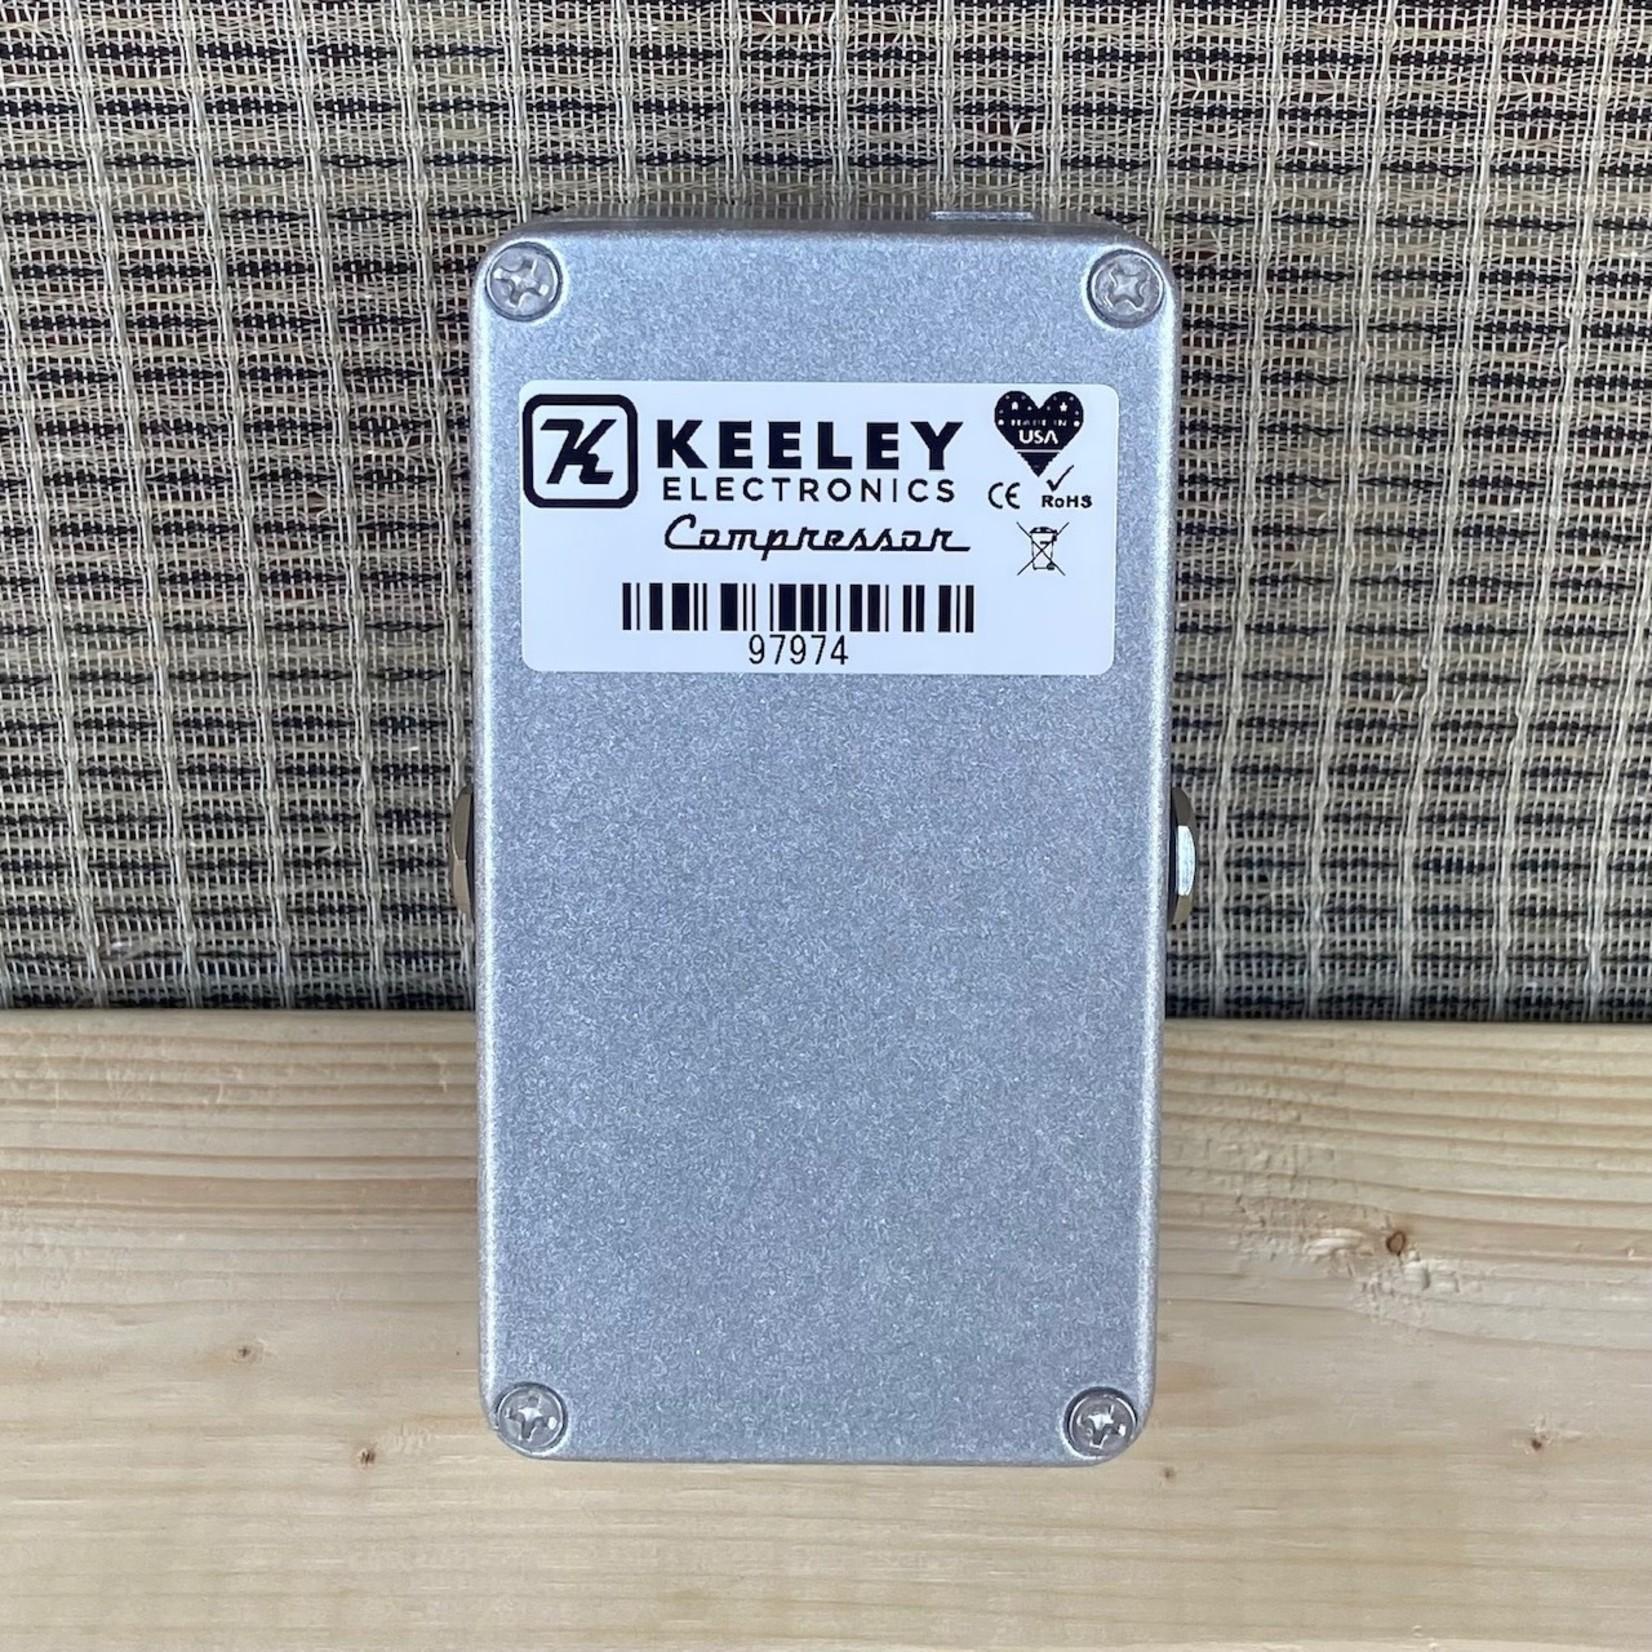 Keeley Electronics Keeley Compressor Plus